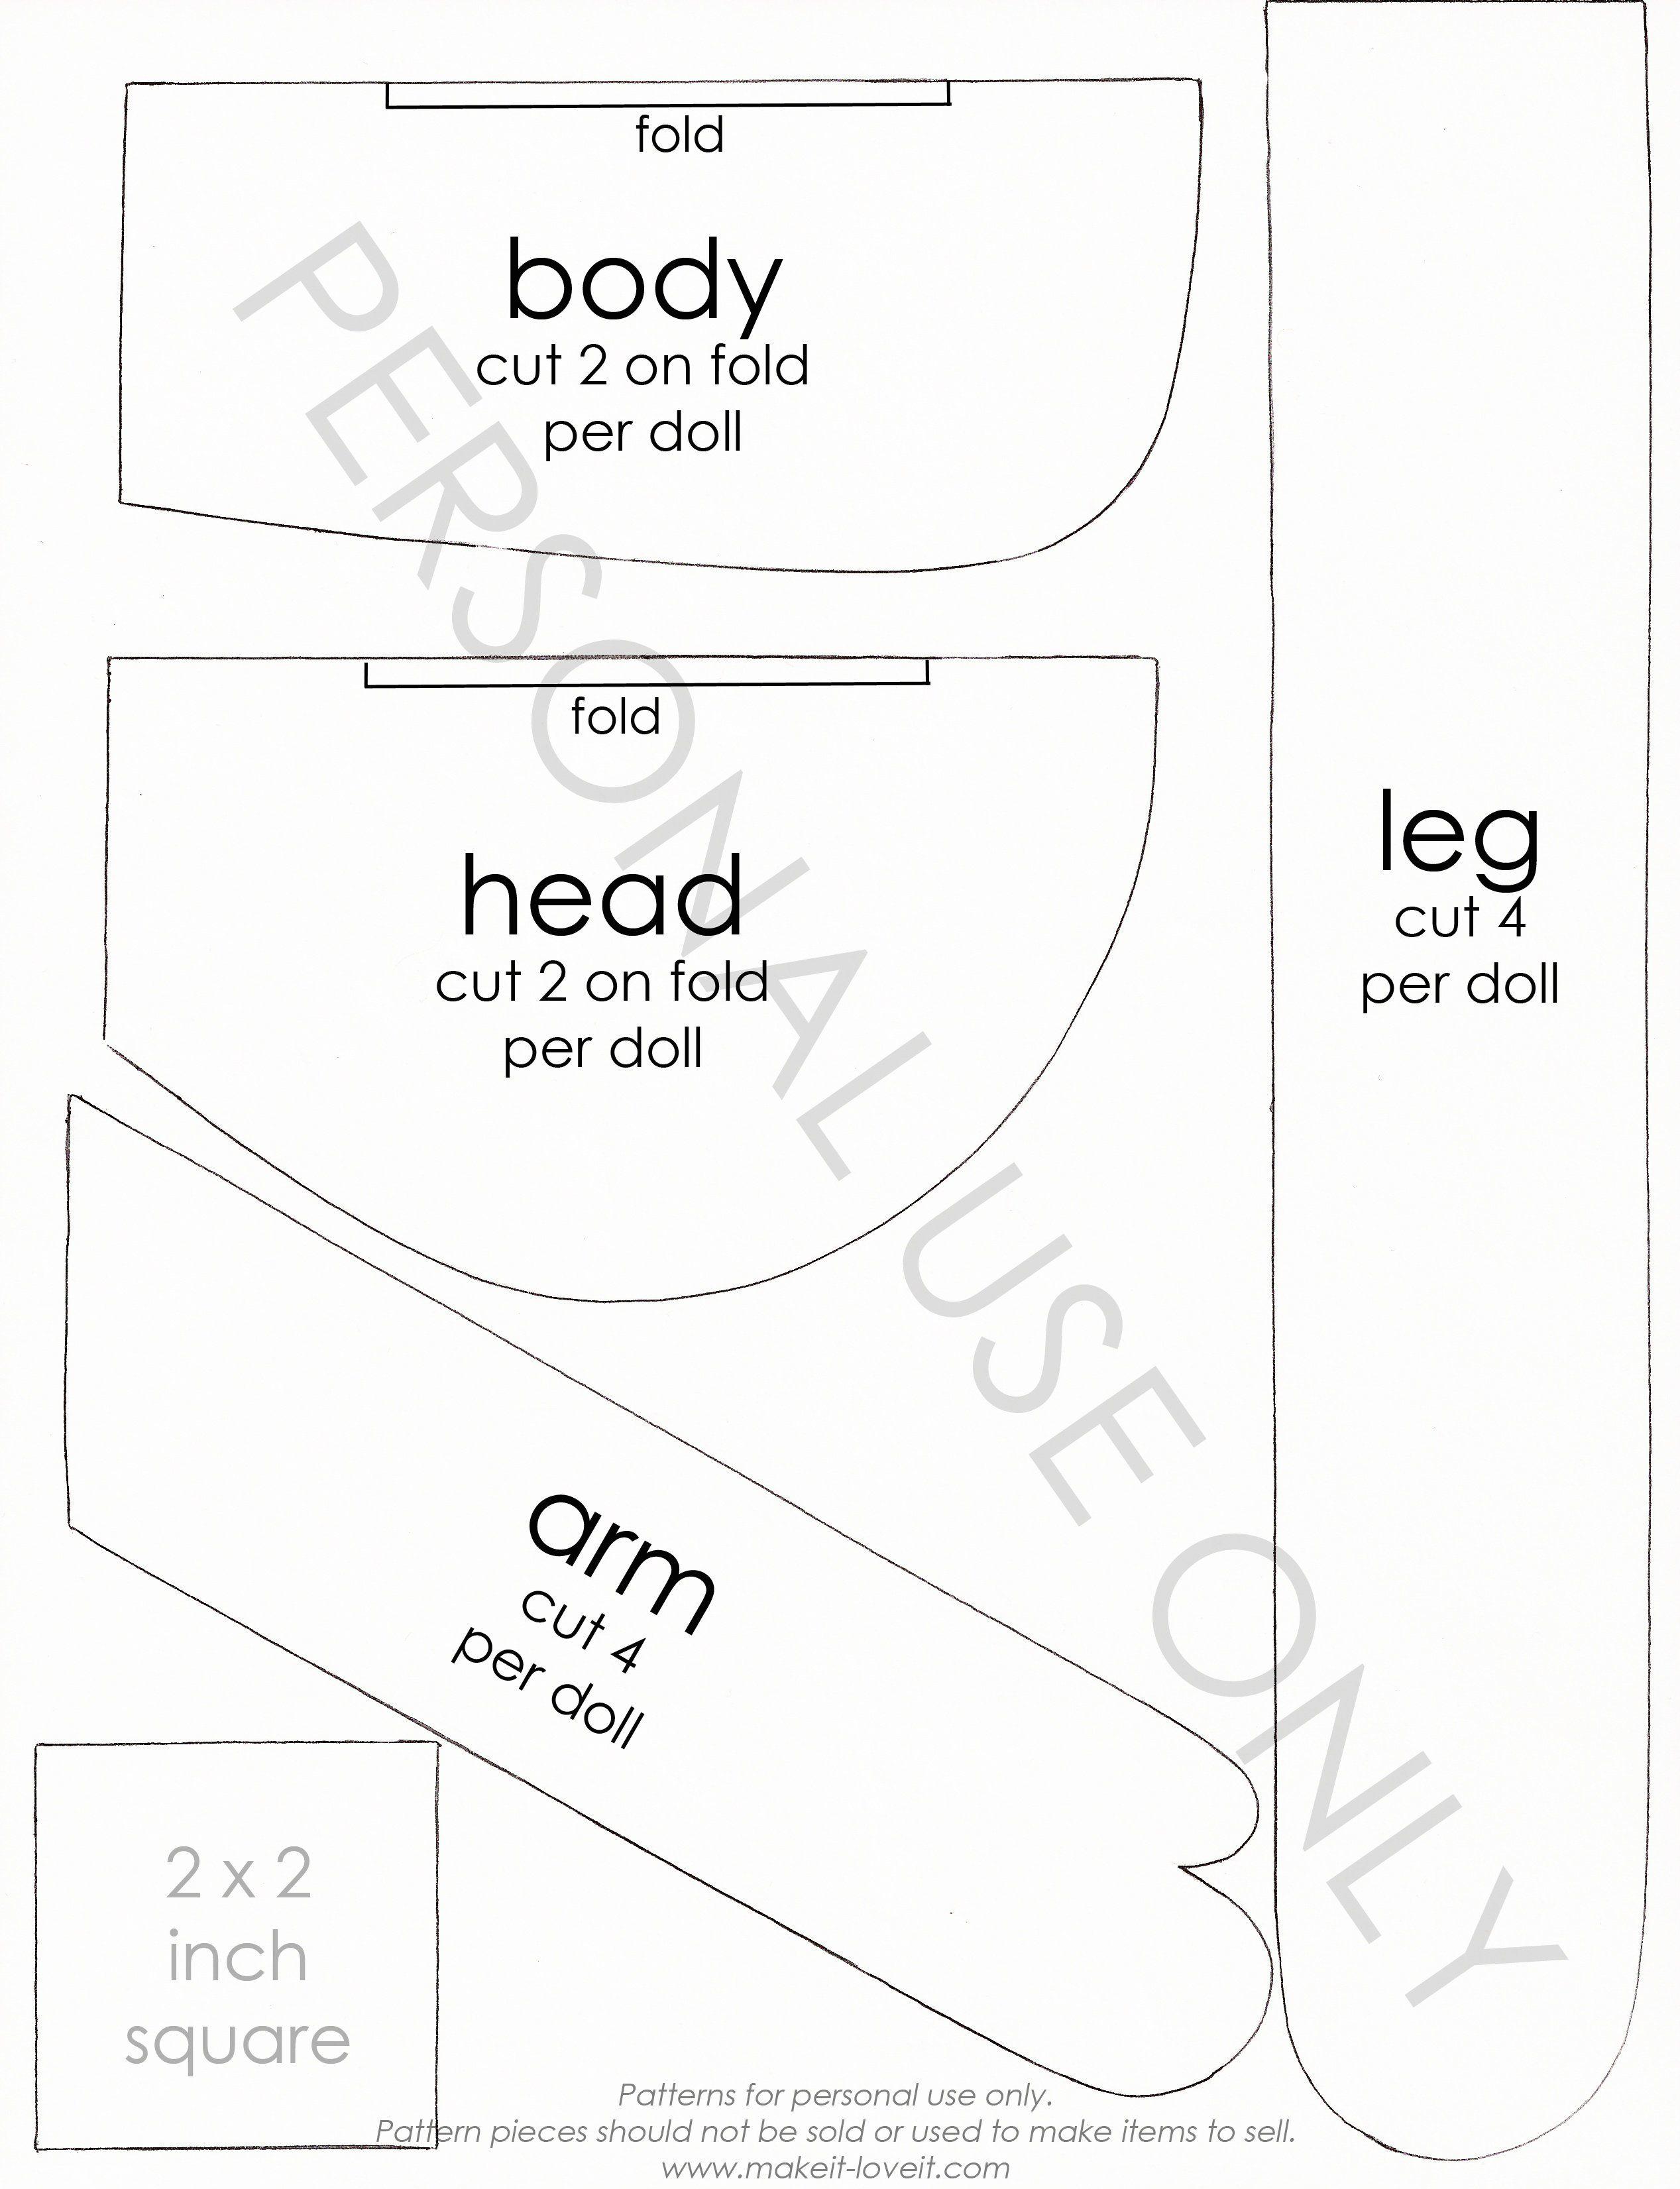 fabric-doll1.jpeg (2535×3303)